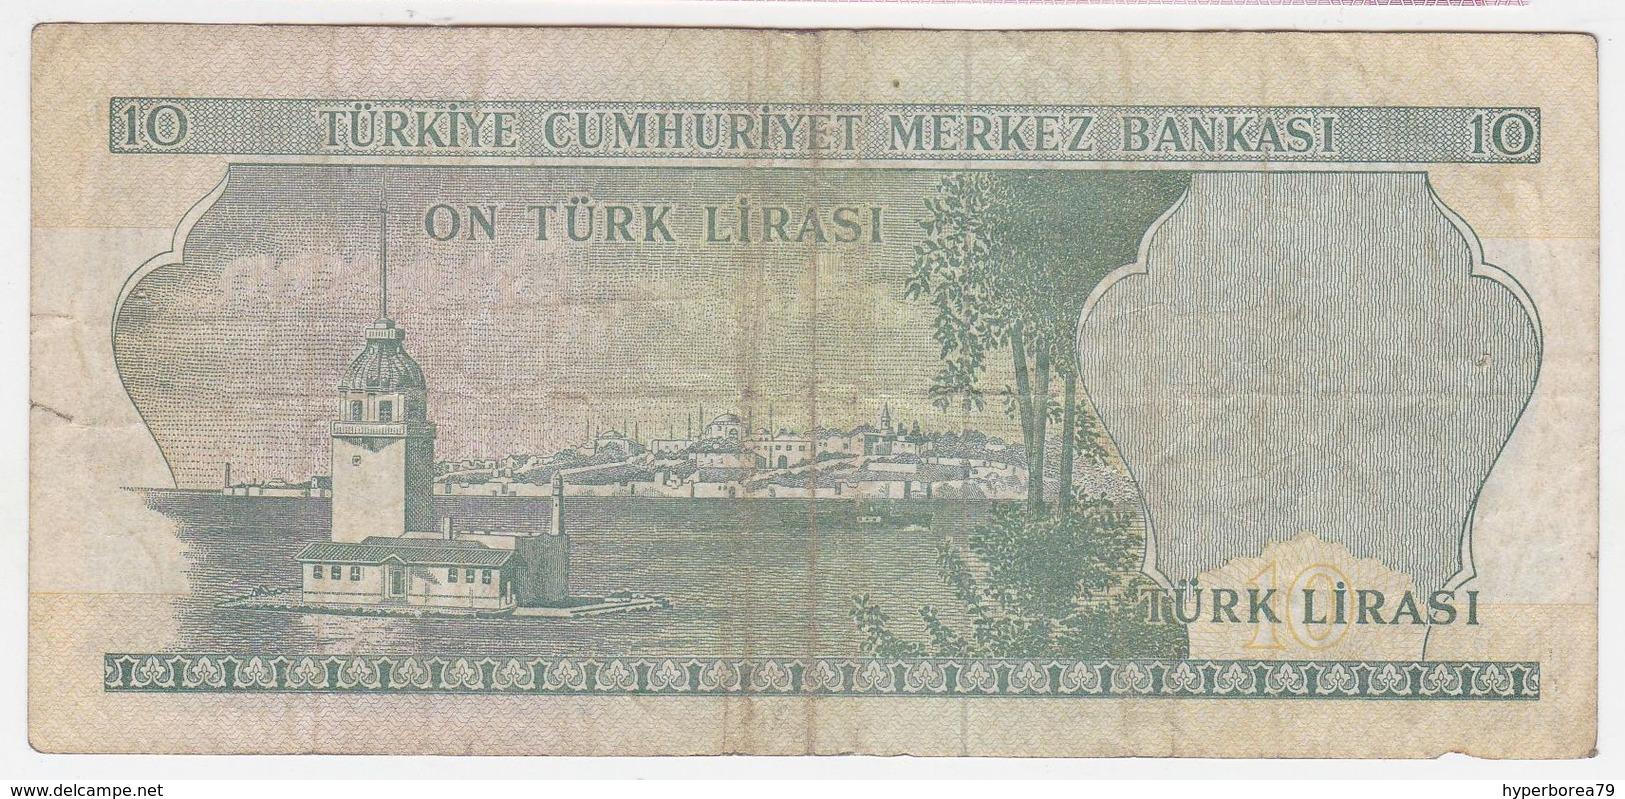 Turkey P 180 - 10 Lira 1966 - Fine+ - Turquie